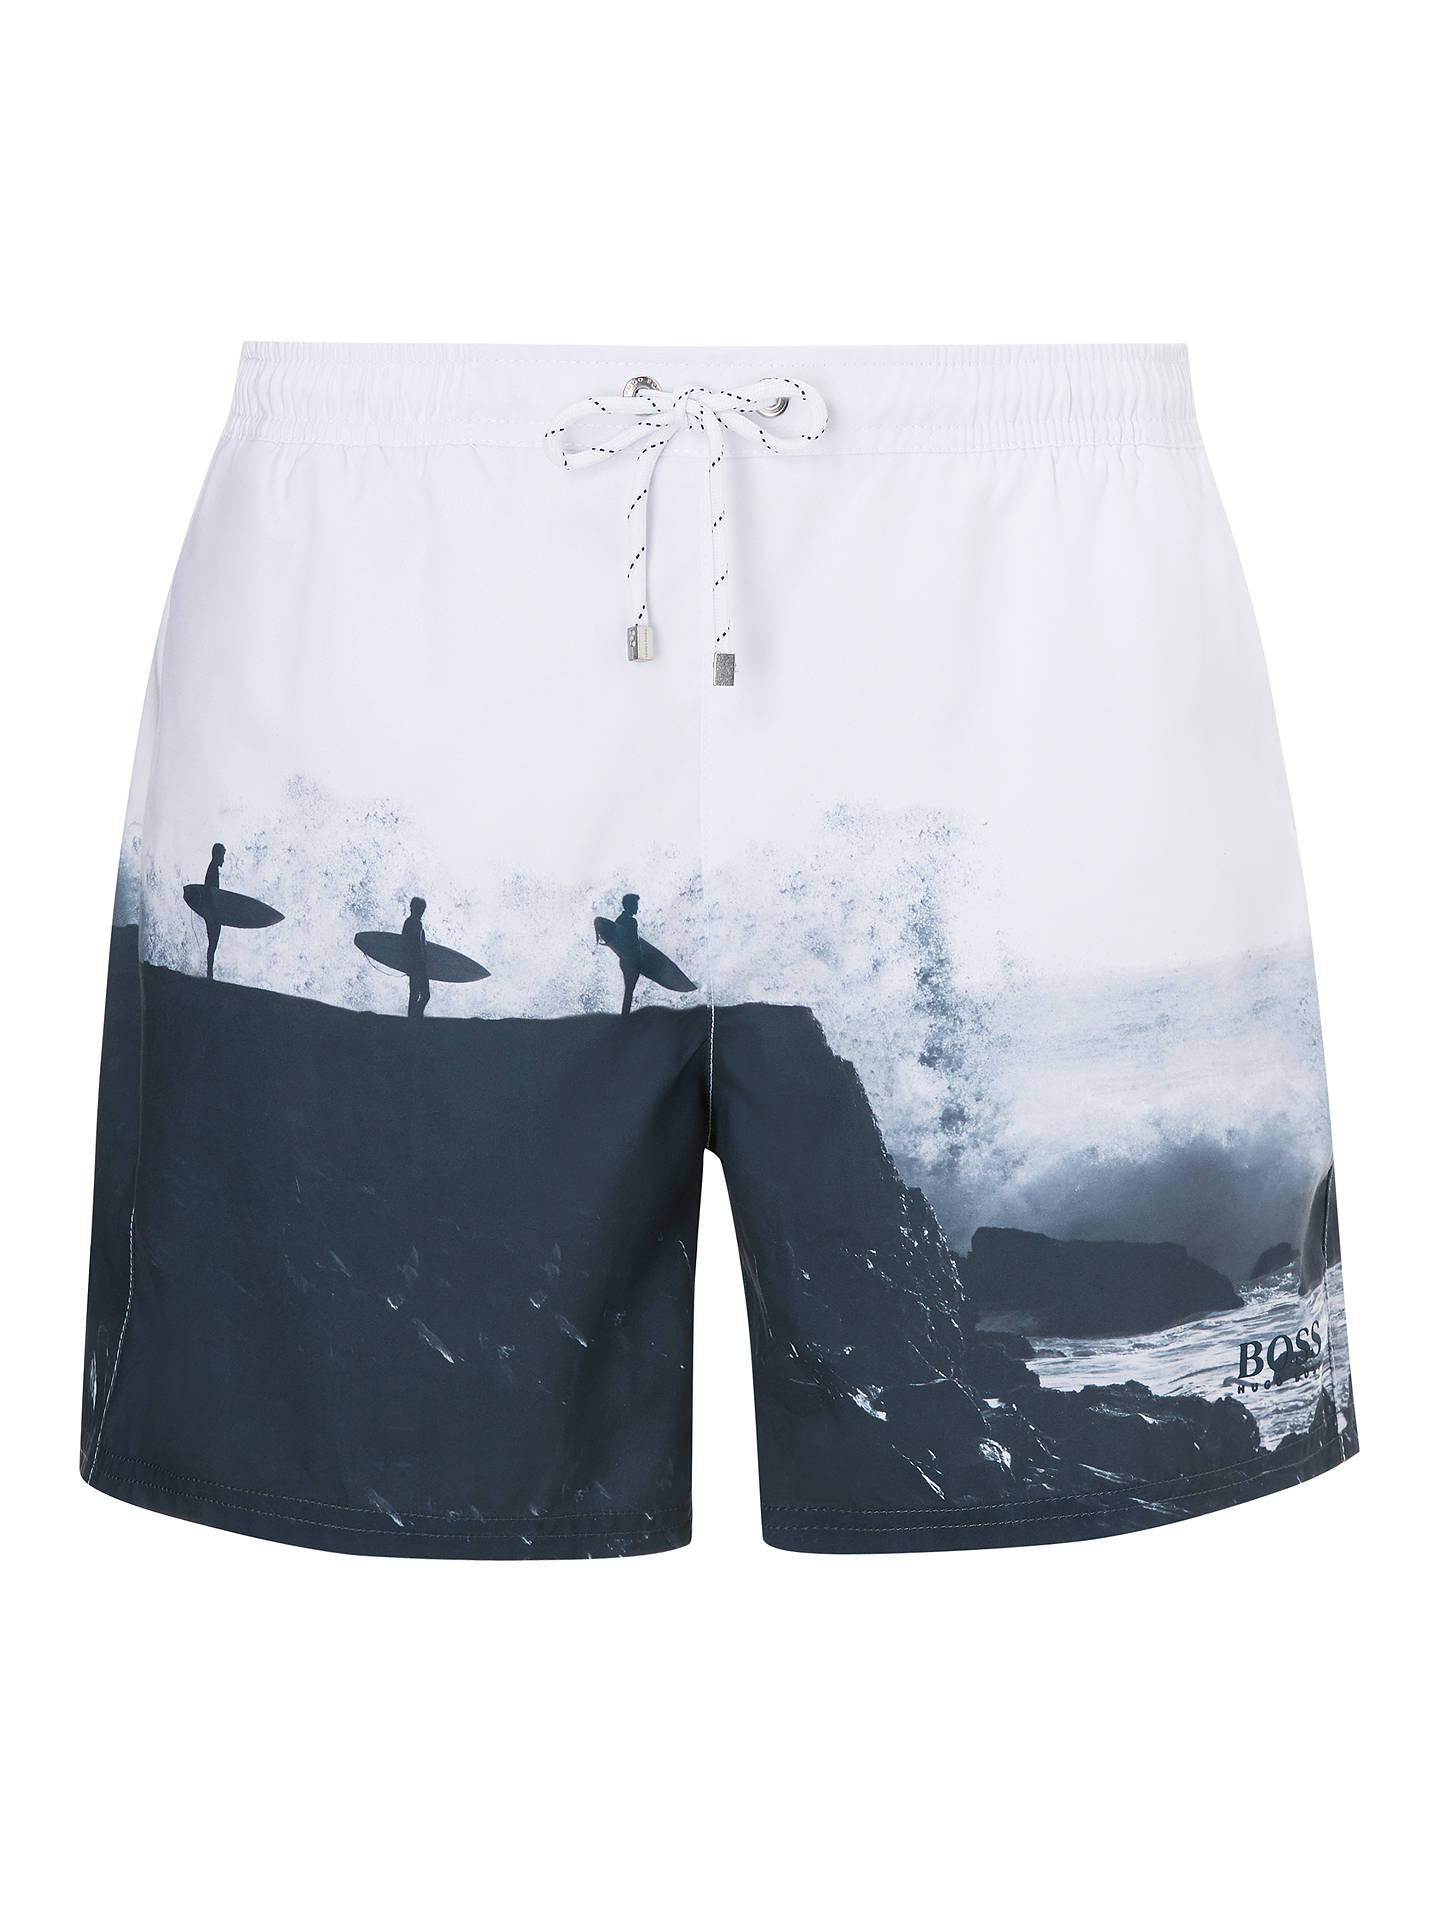 00f8be0425 Buy HUGO BOSS Surfer Photo Swim Shorts, Multi, XL Online at johnlewis.com  ...